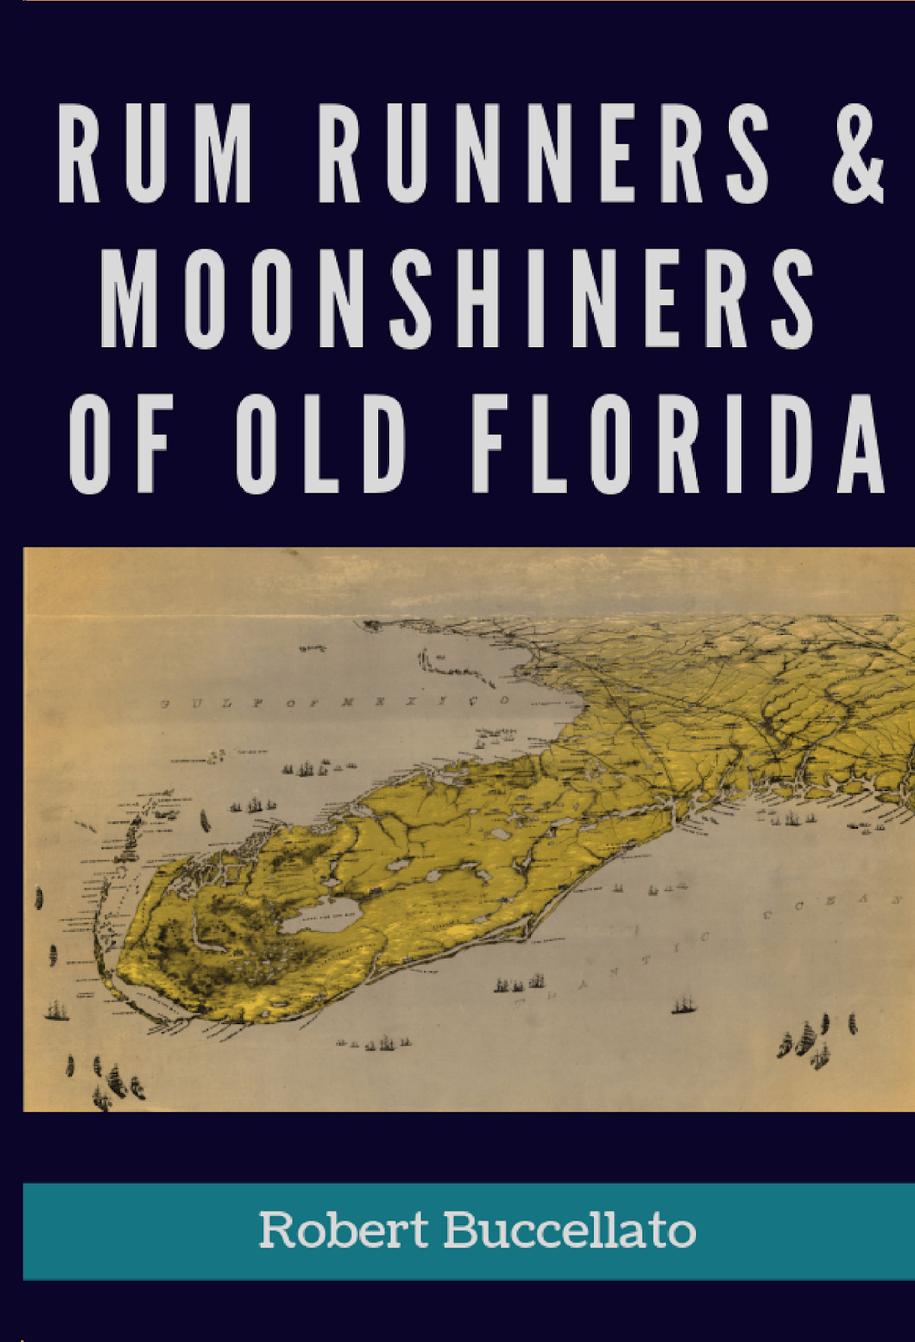 Rum Runners, Bootleggers, and Moonshiners